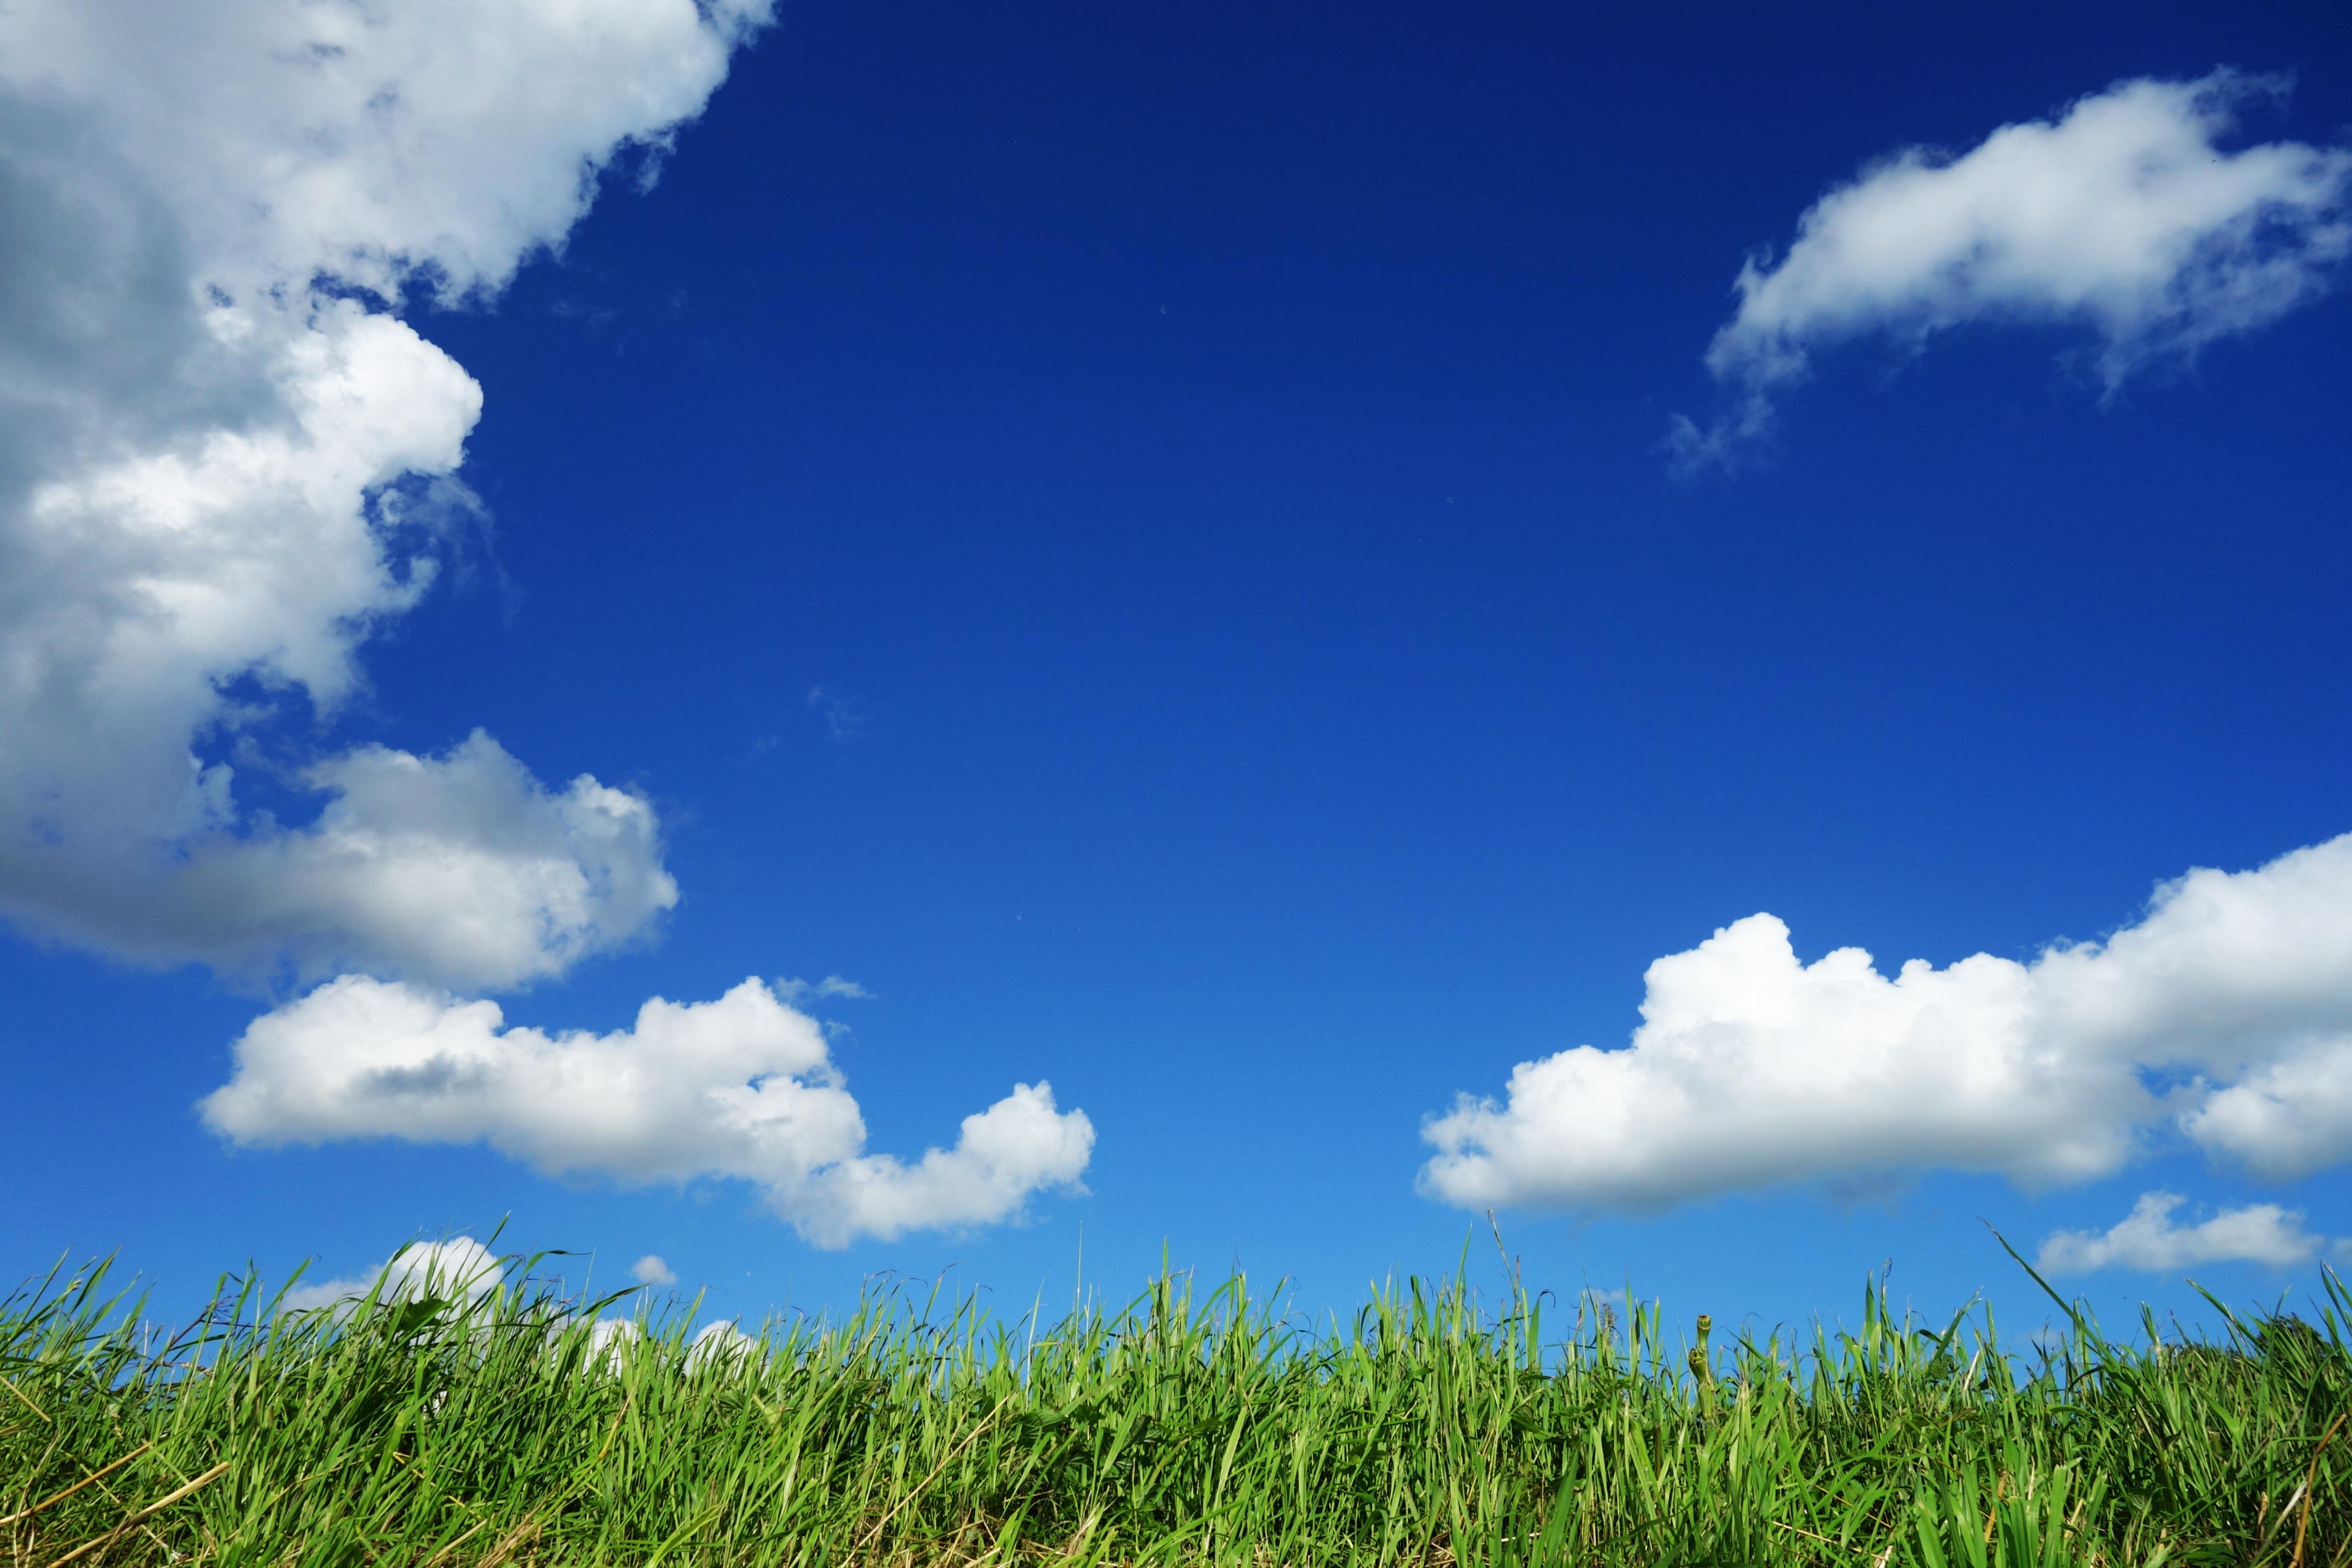 1000 Blauer Himmel Fotos  Pexels  Kostenlose Stock Fotos